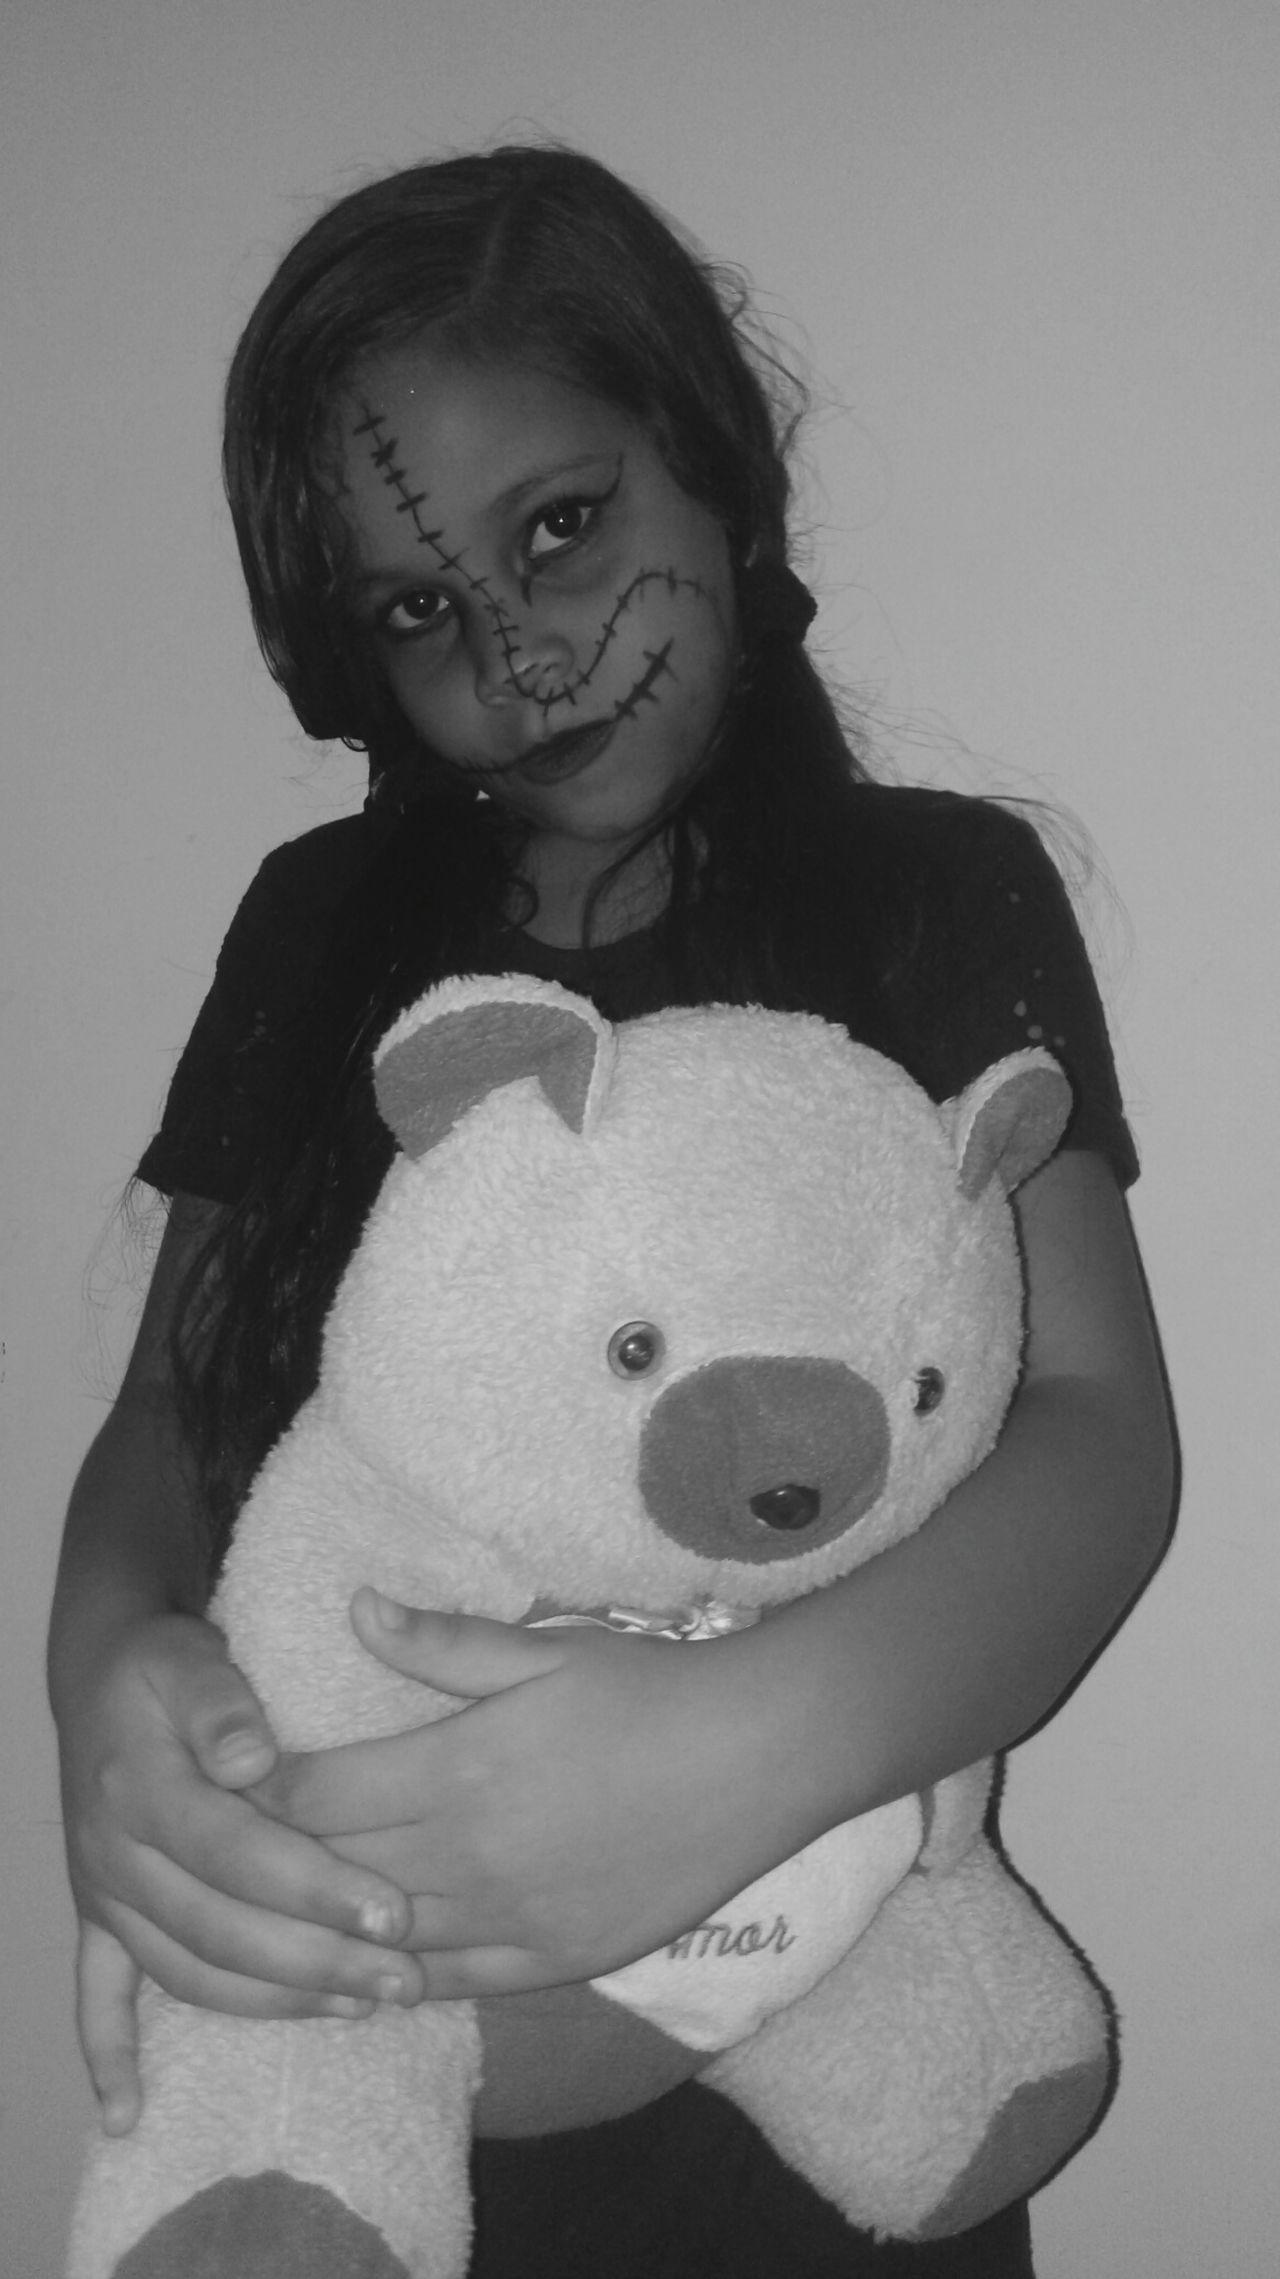 Menina Criança Bonecaassassina Dark Halloween Boneca Doll Assustador Foto Pinturafacial Arte Face Artenaface EyeEmNewHere